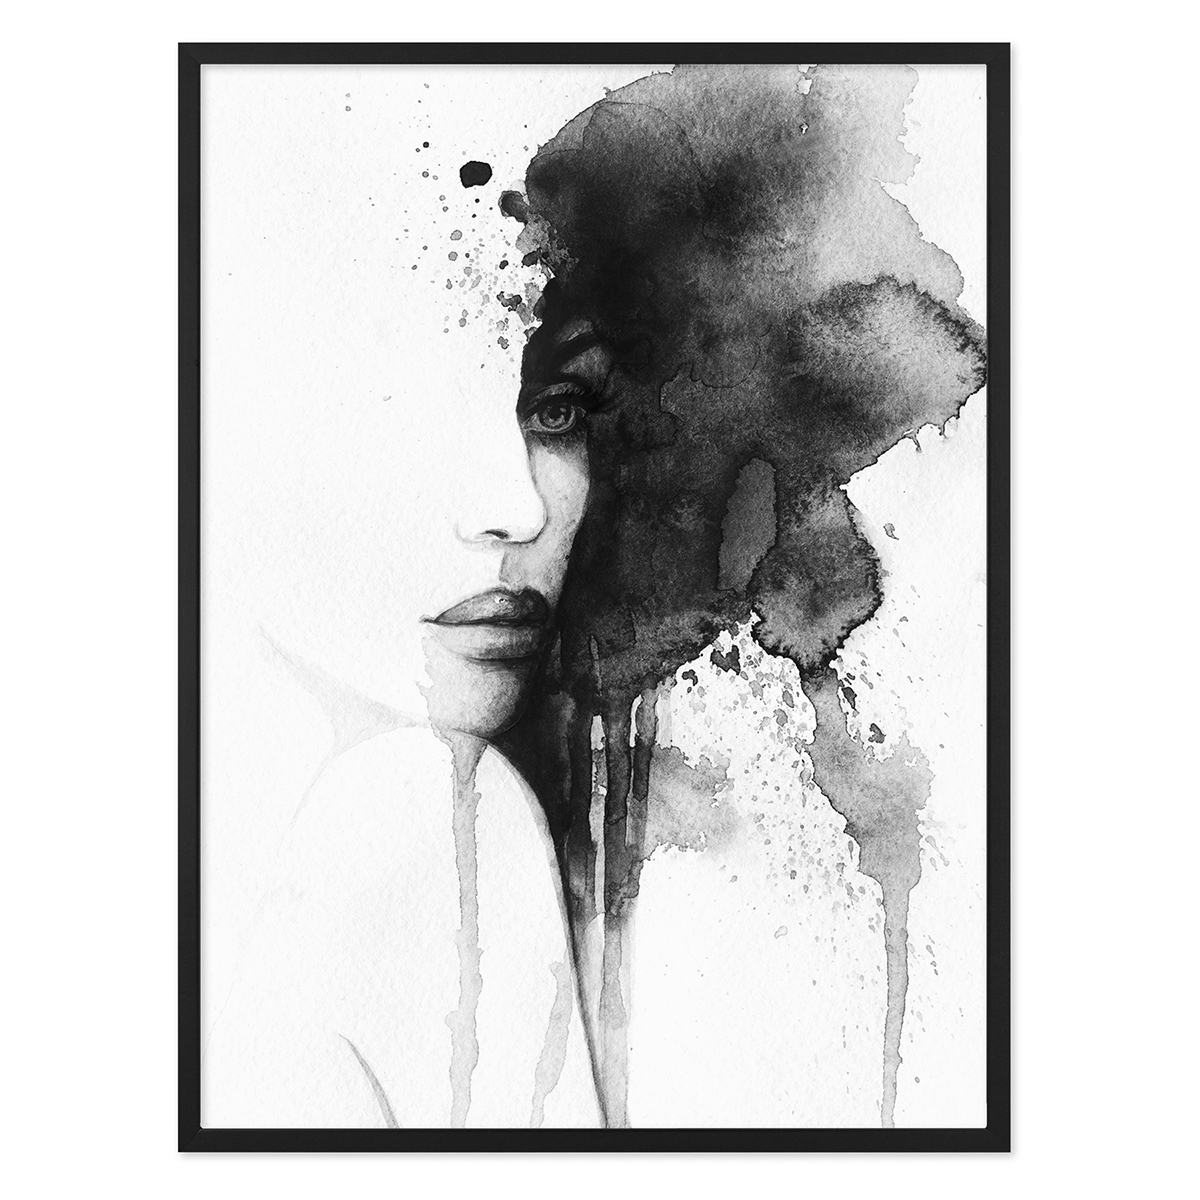 6f76a86296f35 Design-Poster 'Aquarell Frau' 30x40 cm schwarz-weiss Abstrakt Poster ...